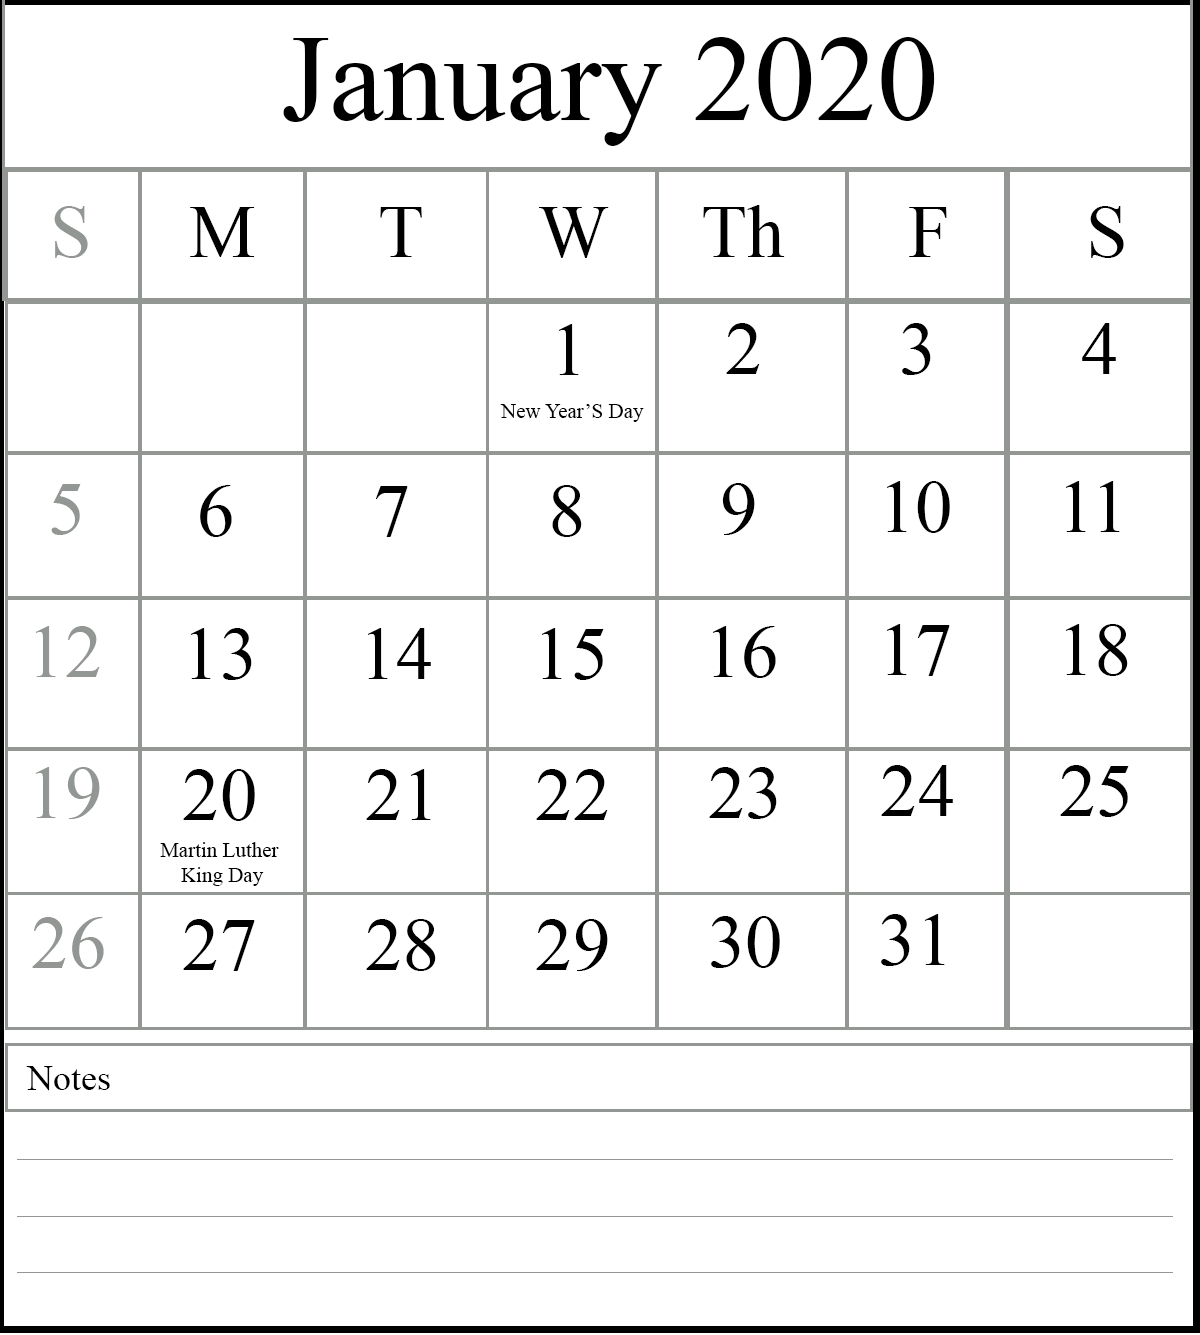 Free Printable January 2020 Calendar Editable In Pdf, Excel